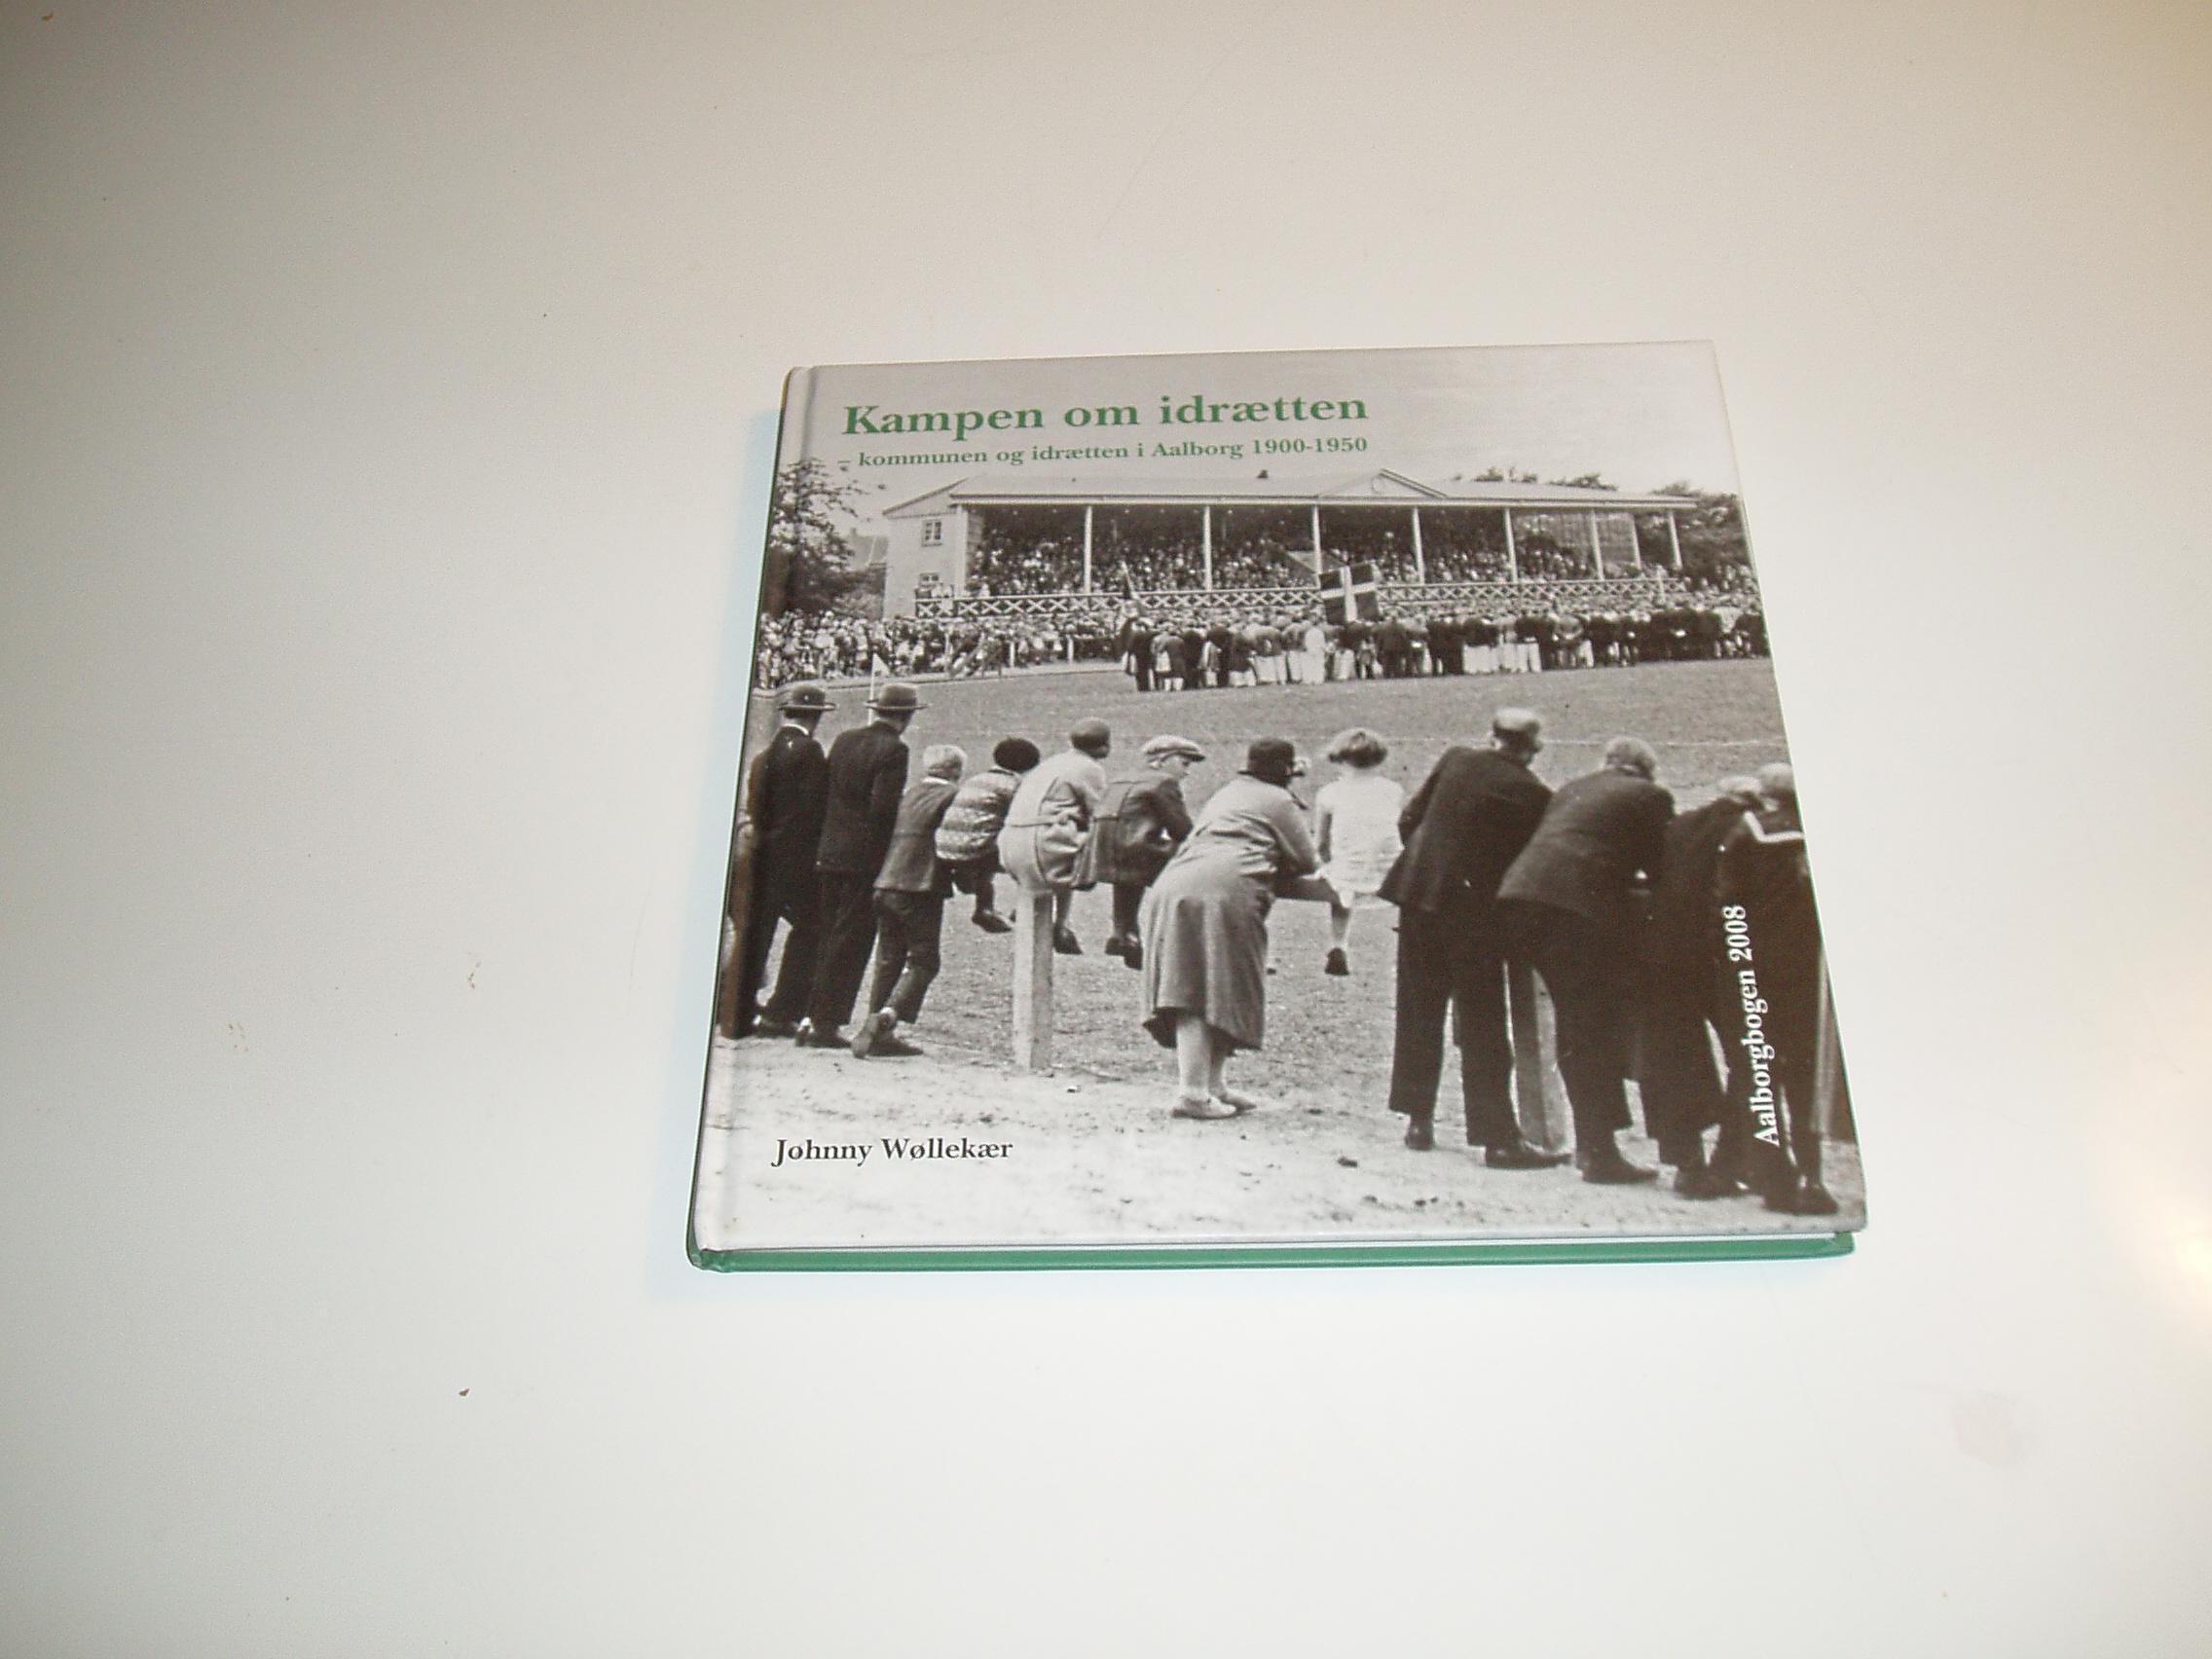 Kampen om idrætten - kommunen og idrætten i Aalborg 1900-1950